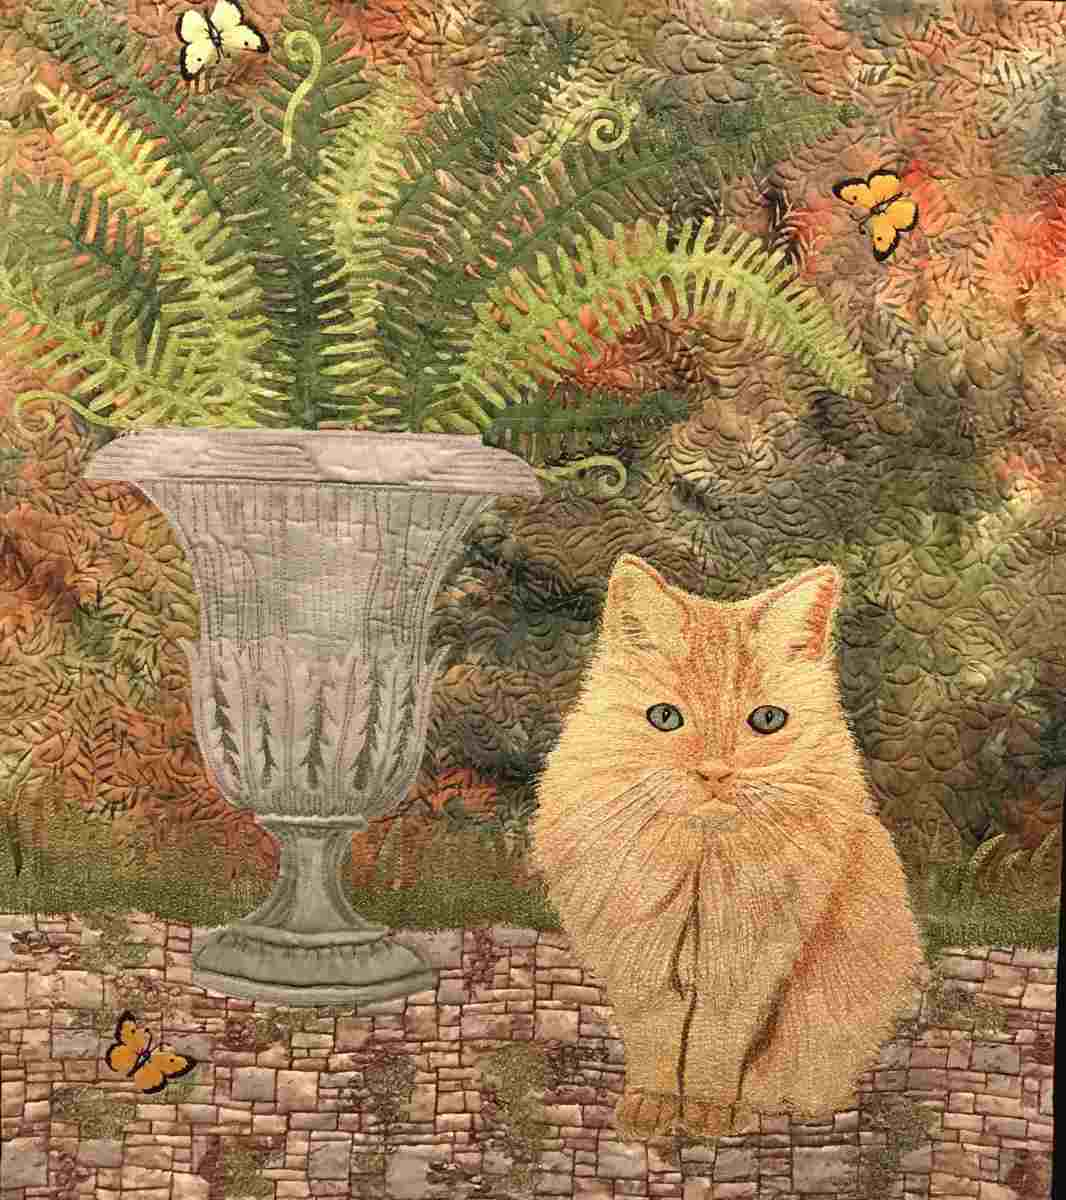 Darlene-Garstecki-Jeffs-Cat